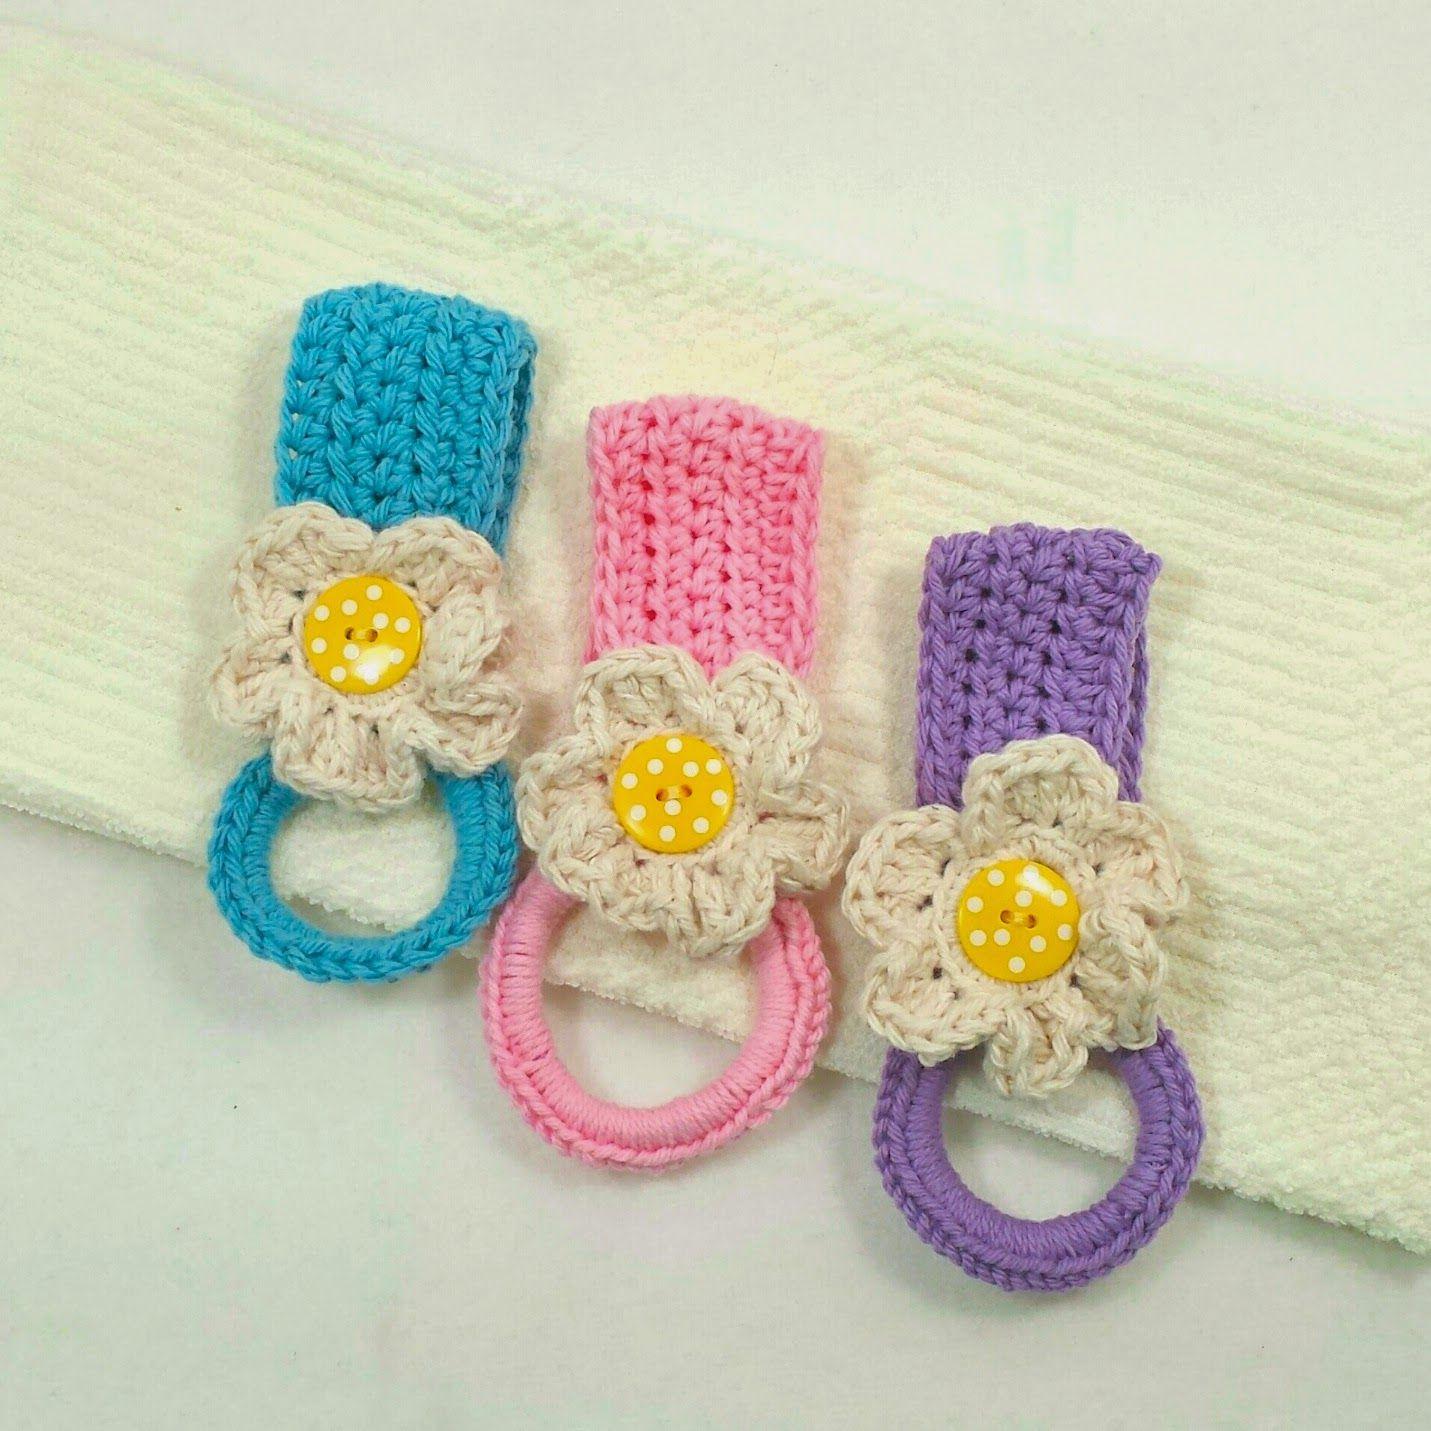 Daisy Towel Holder | Future sewing | Pinterest | Handtuchhalter